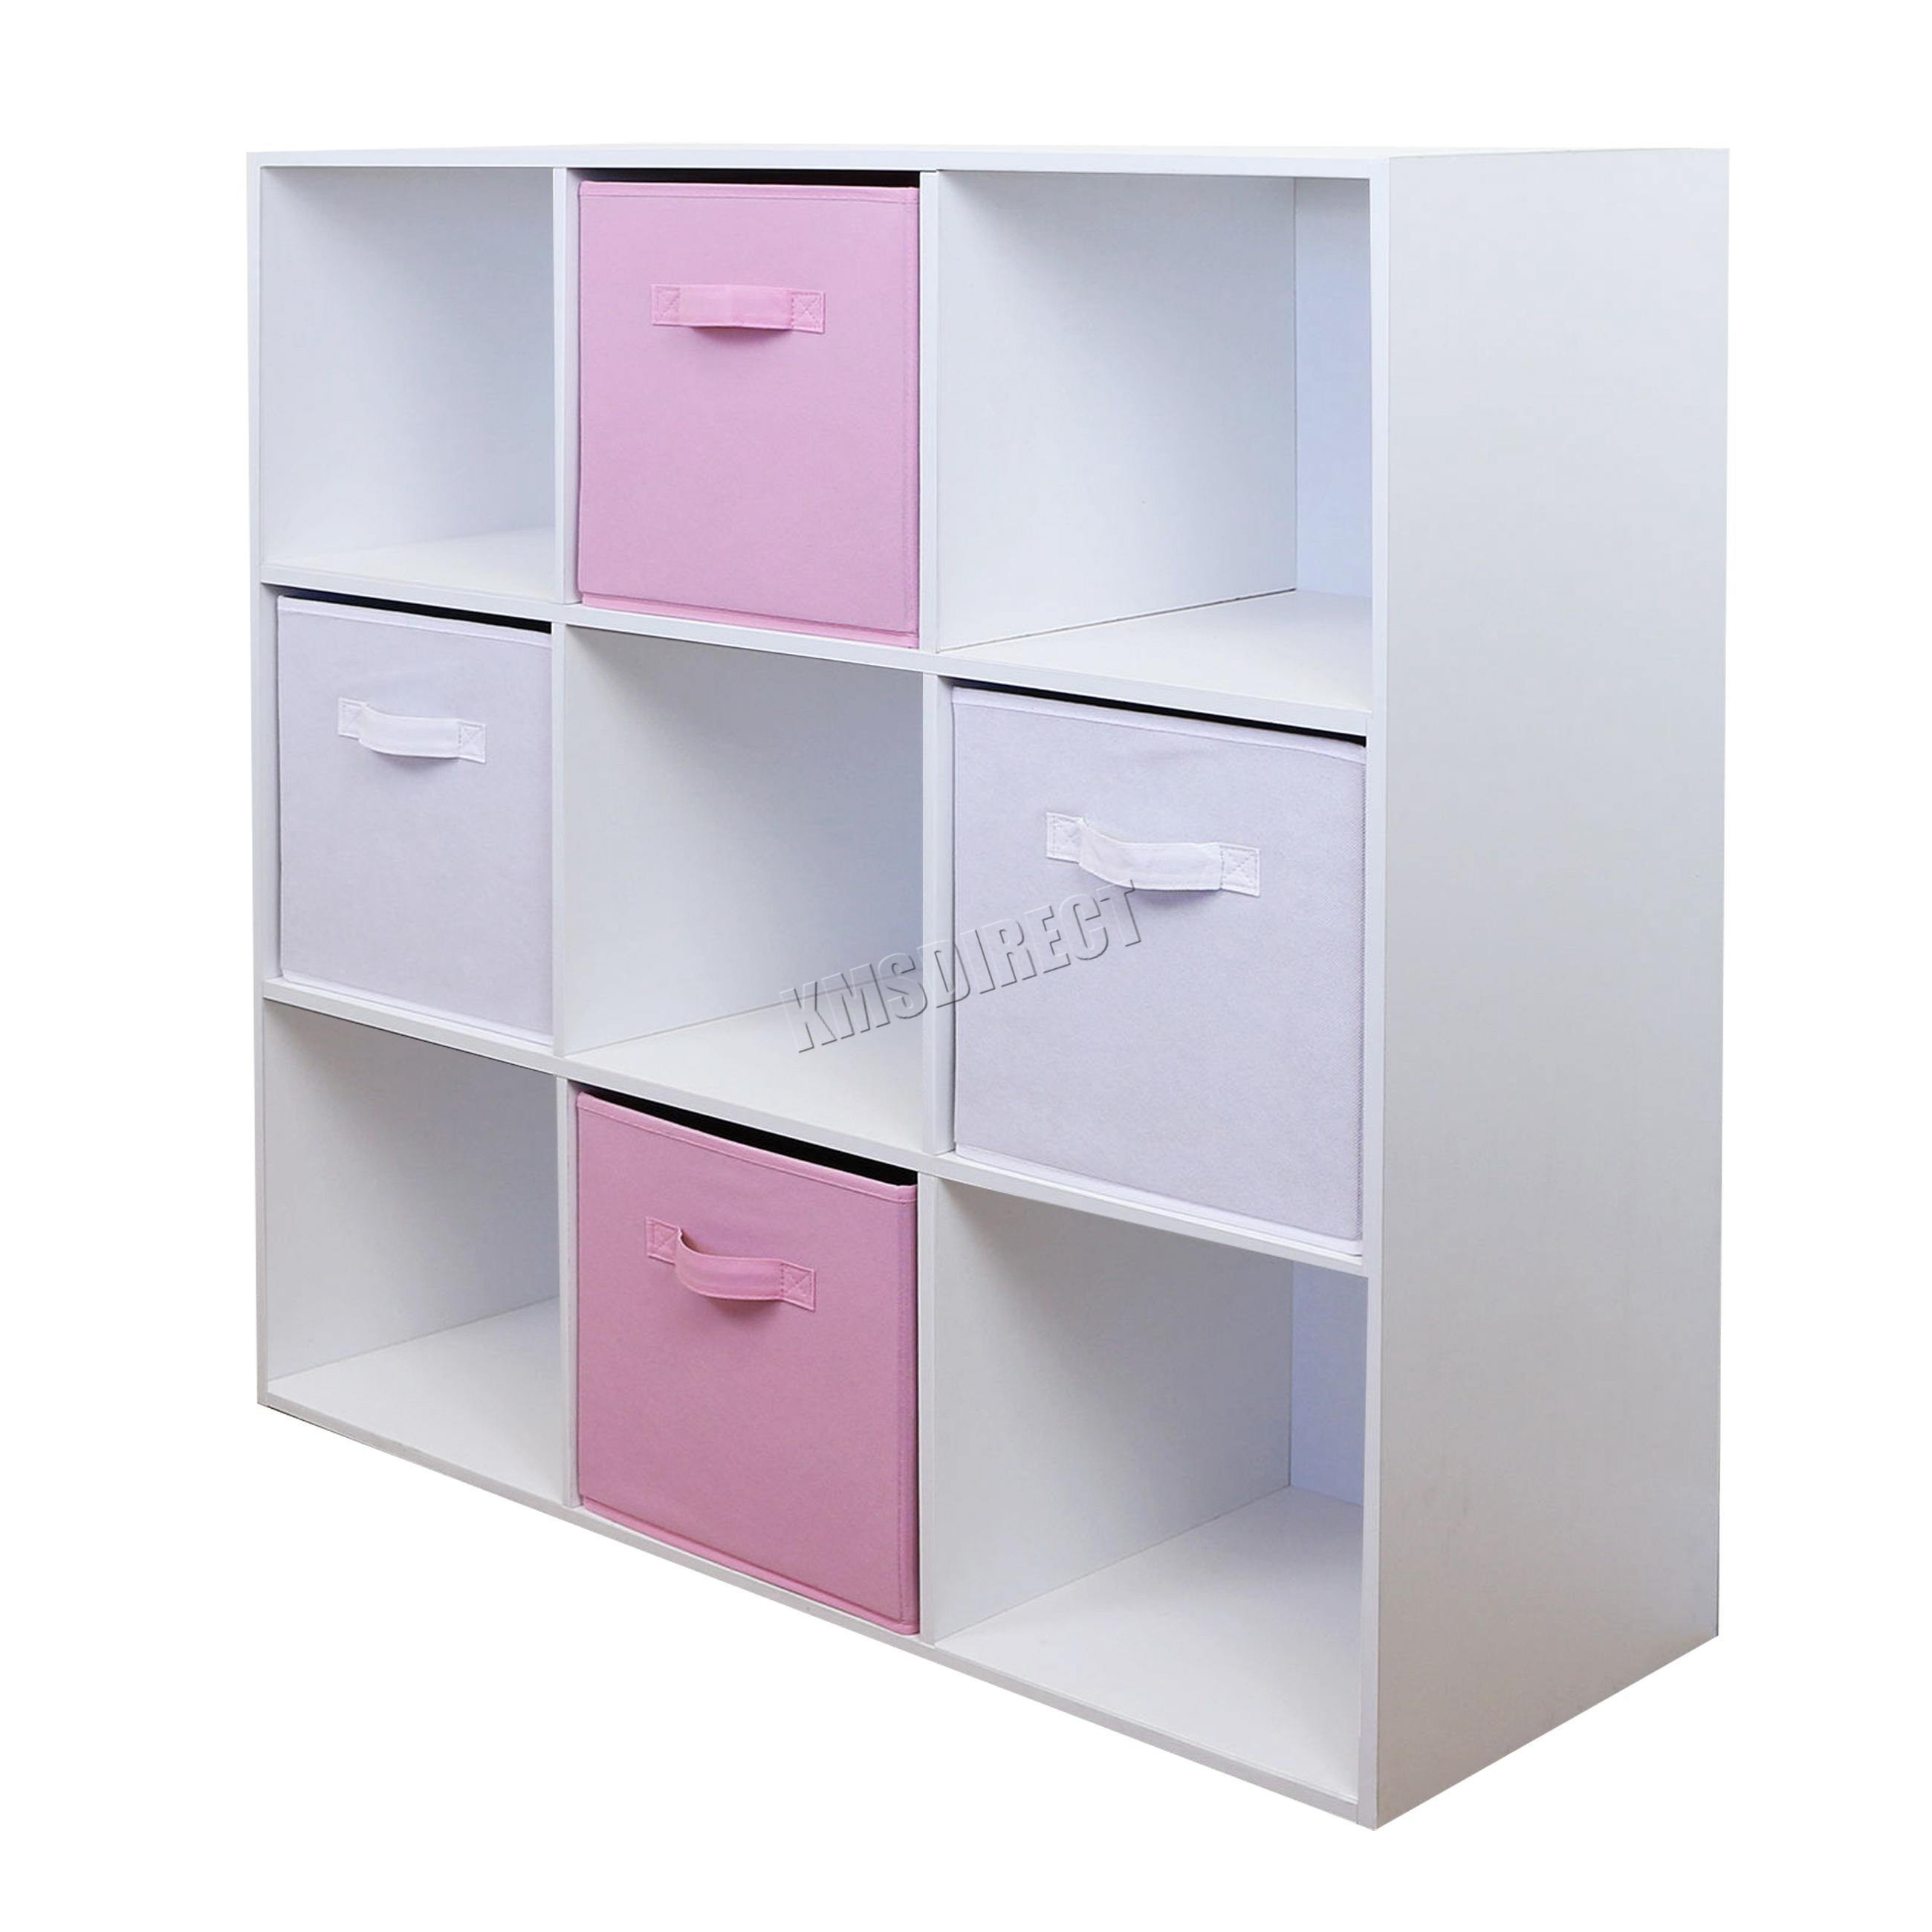 Childrens Kids 3 Tier Toy Bedroom Storage Shelf Unit 8: FoxHunter Toy Storage Boxes